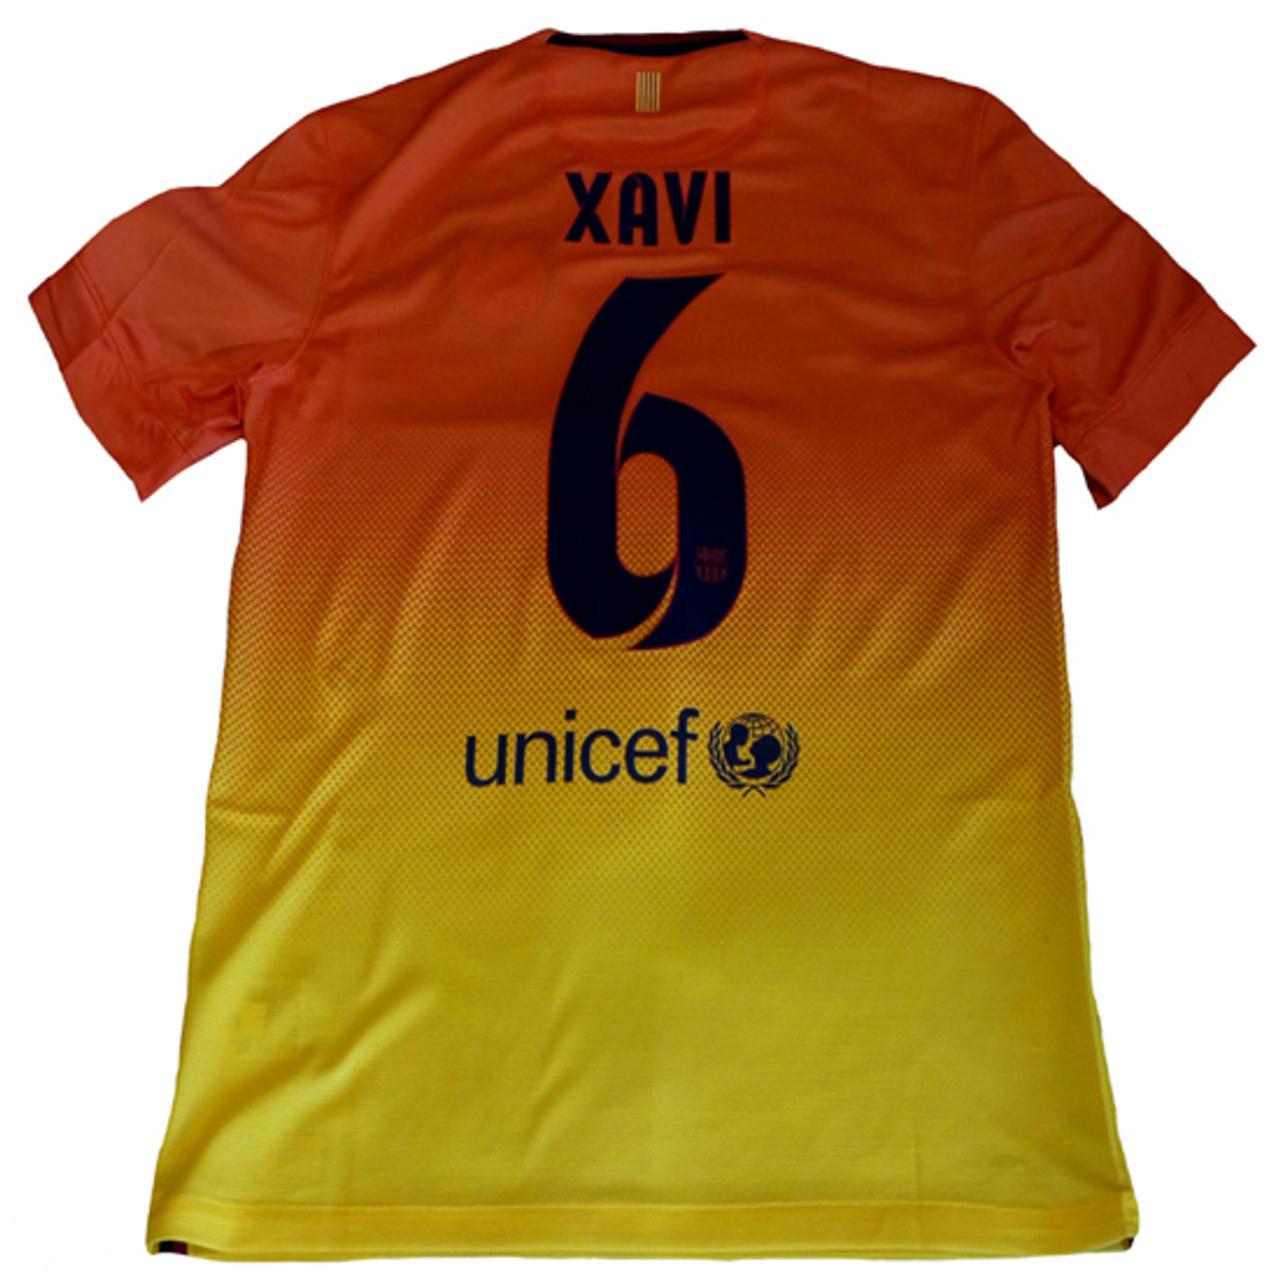 buy online 39ded 0af82 NIKE BARCELONA 2013 AWAY `XAVI` JERSEY Safety Orange/Tour Yellow1